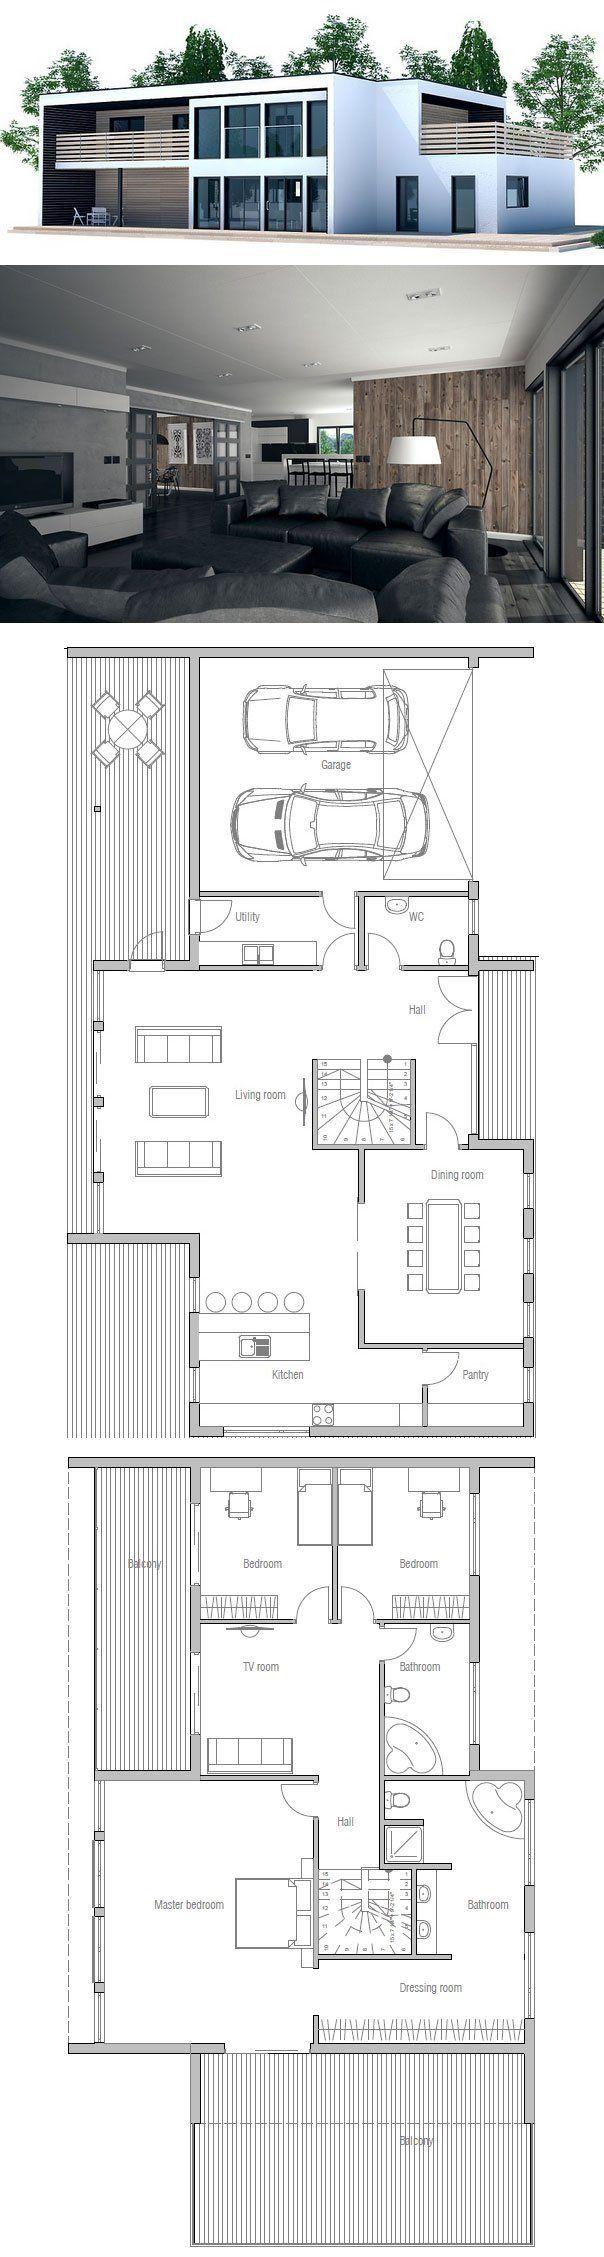 79 best houses images on pinterest home plans house blueprints